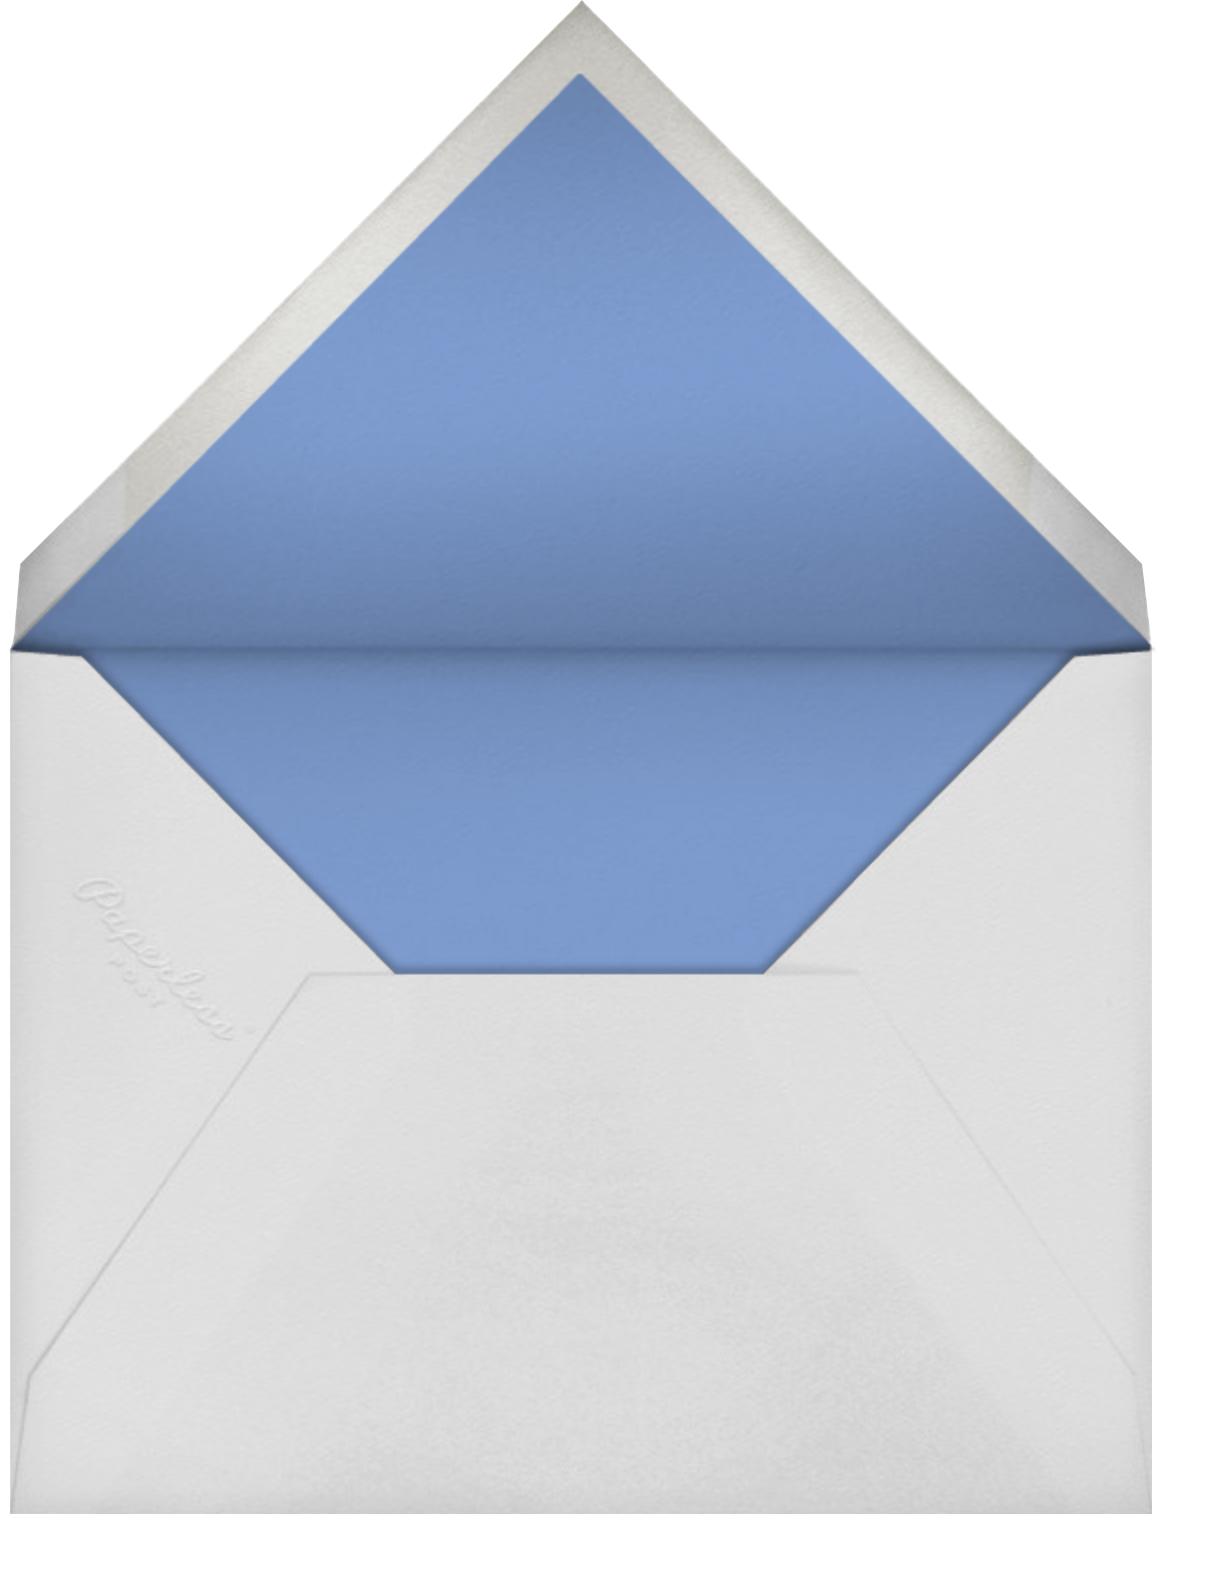 Firth - Newport Blue - Vera Wang - Anniversary party - envelope back